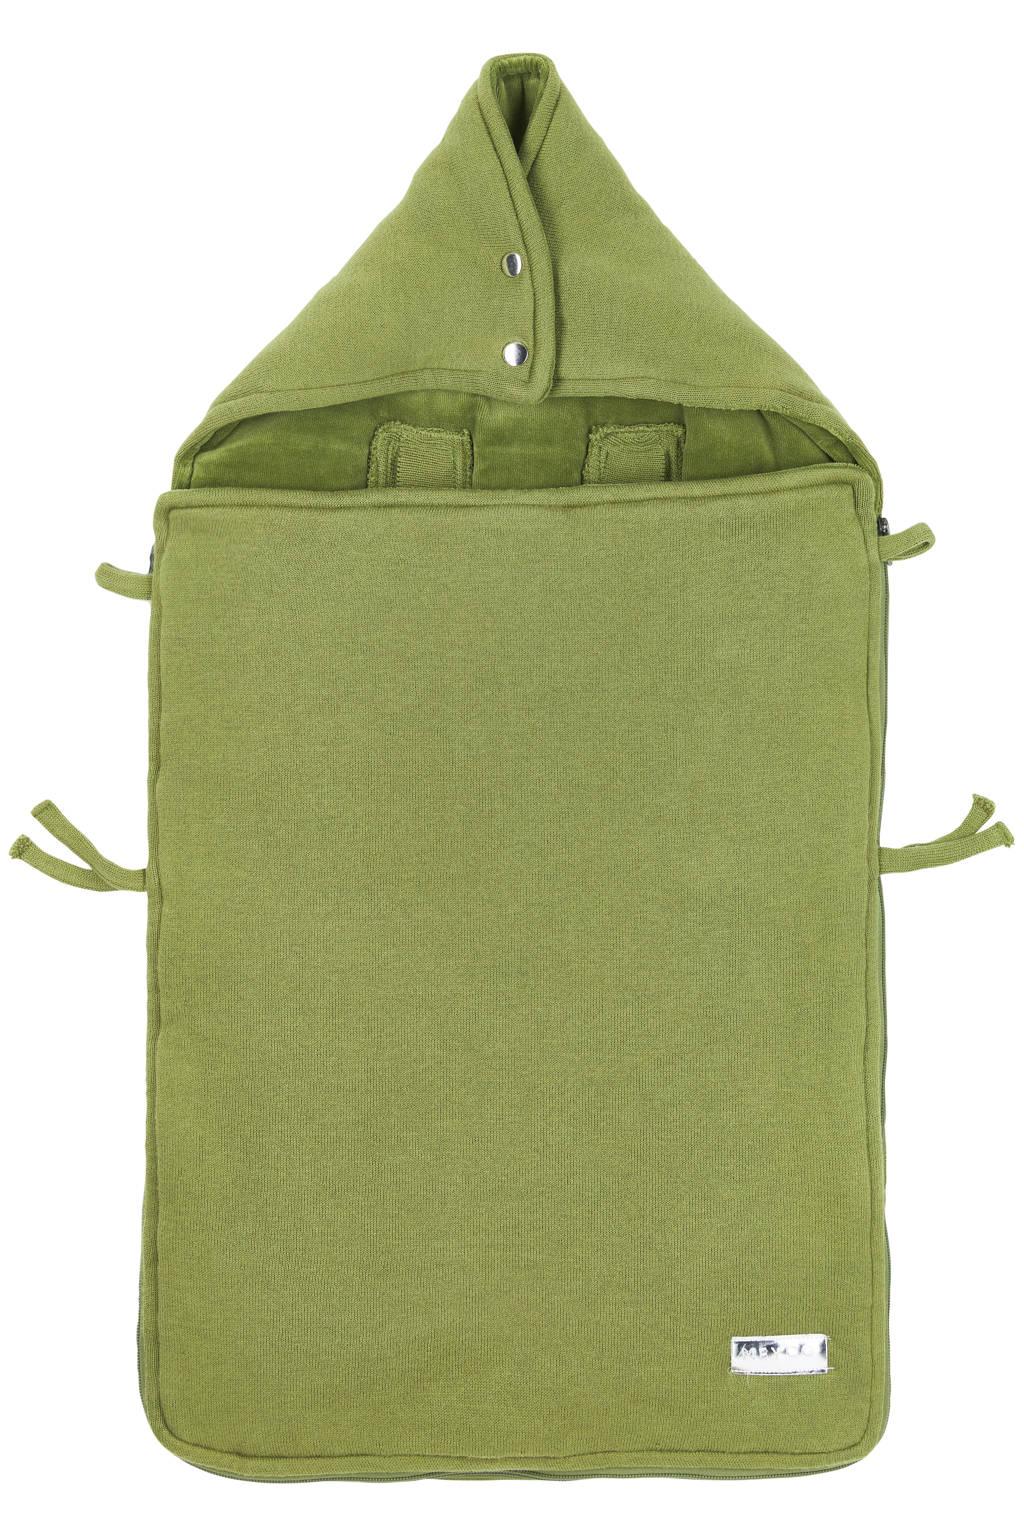 Meyco gebreide autostoel voetenzak Knit basic avocado, Groen